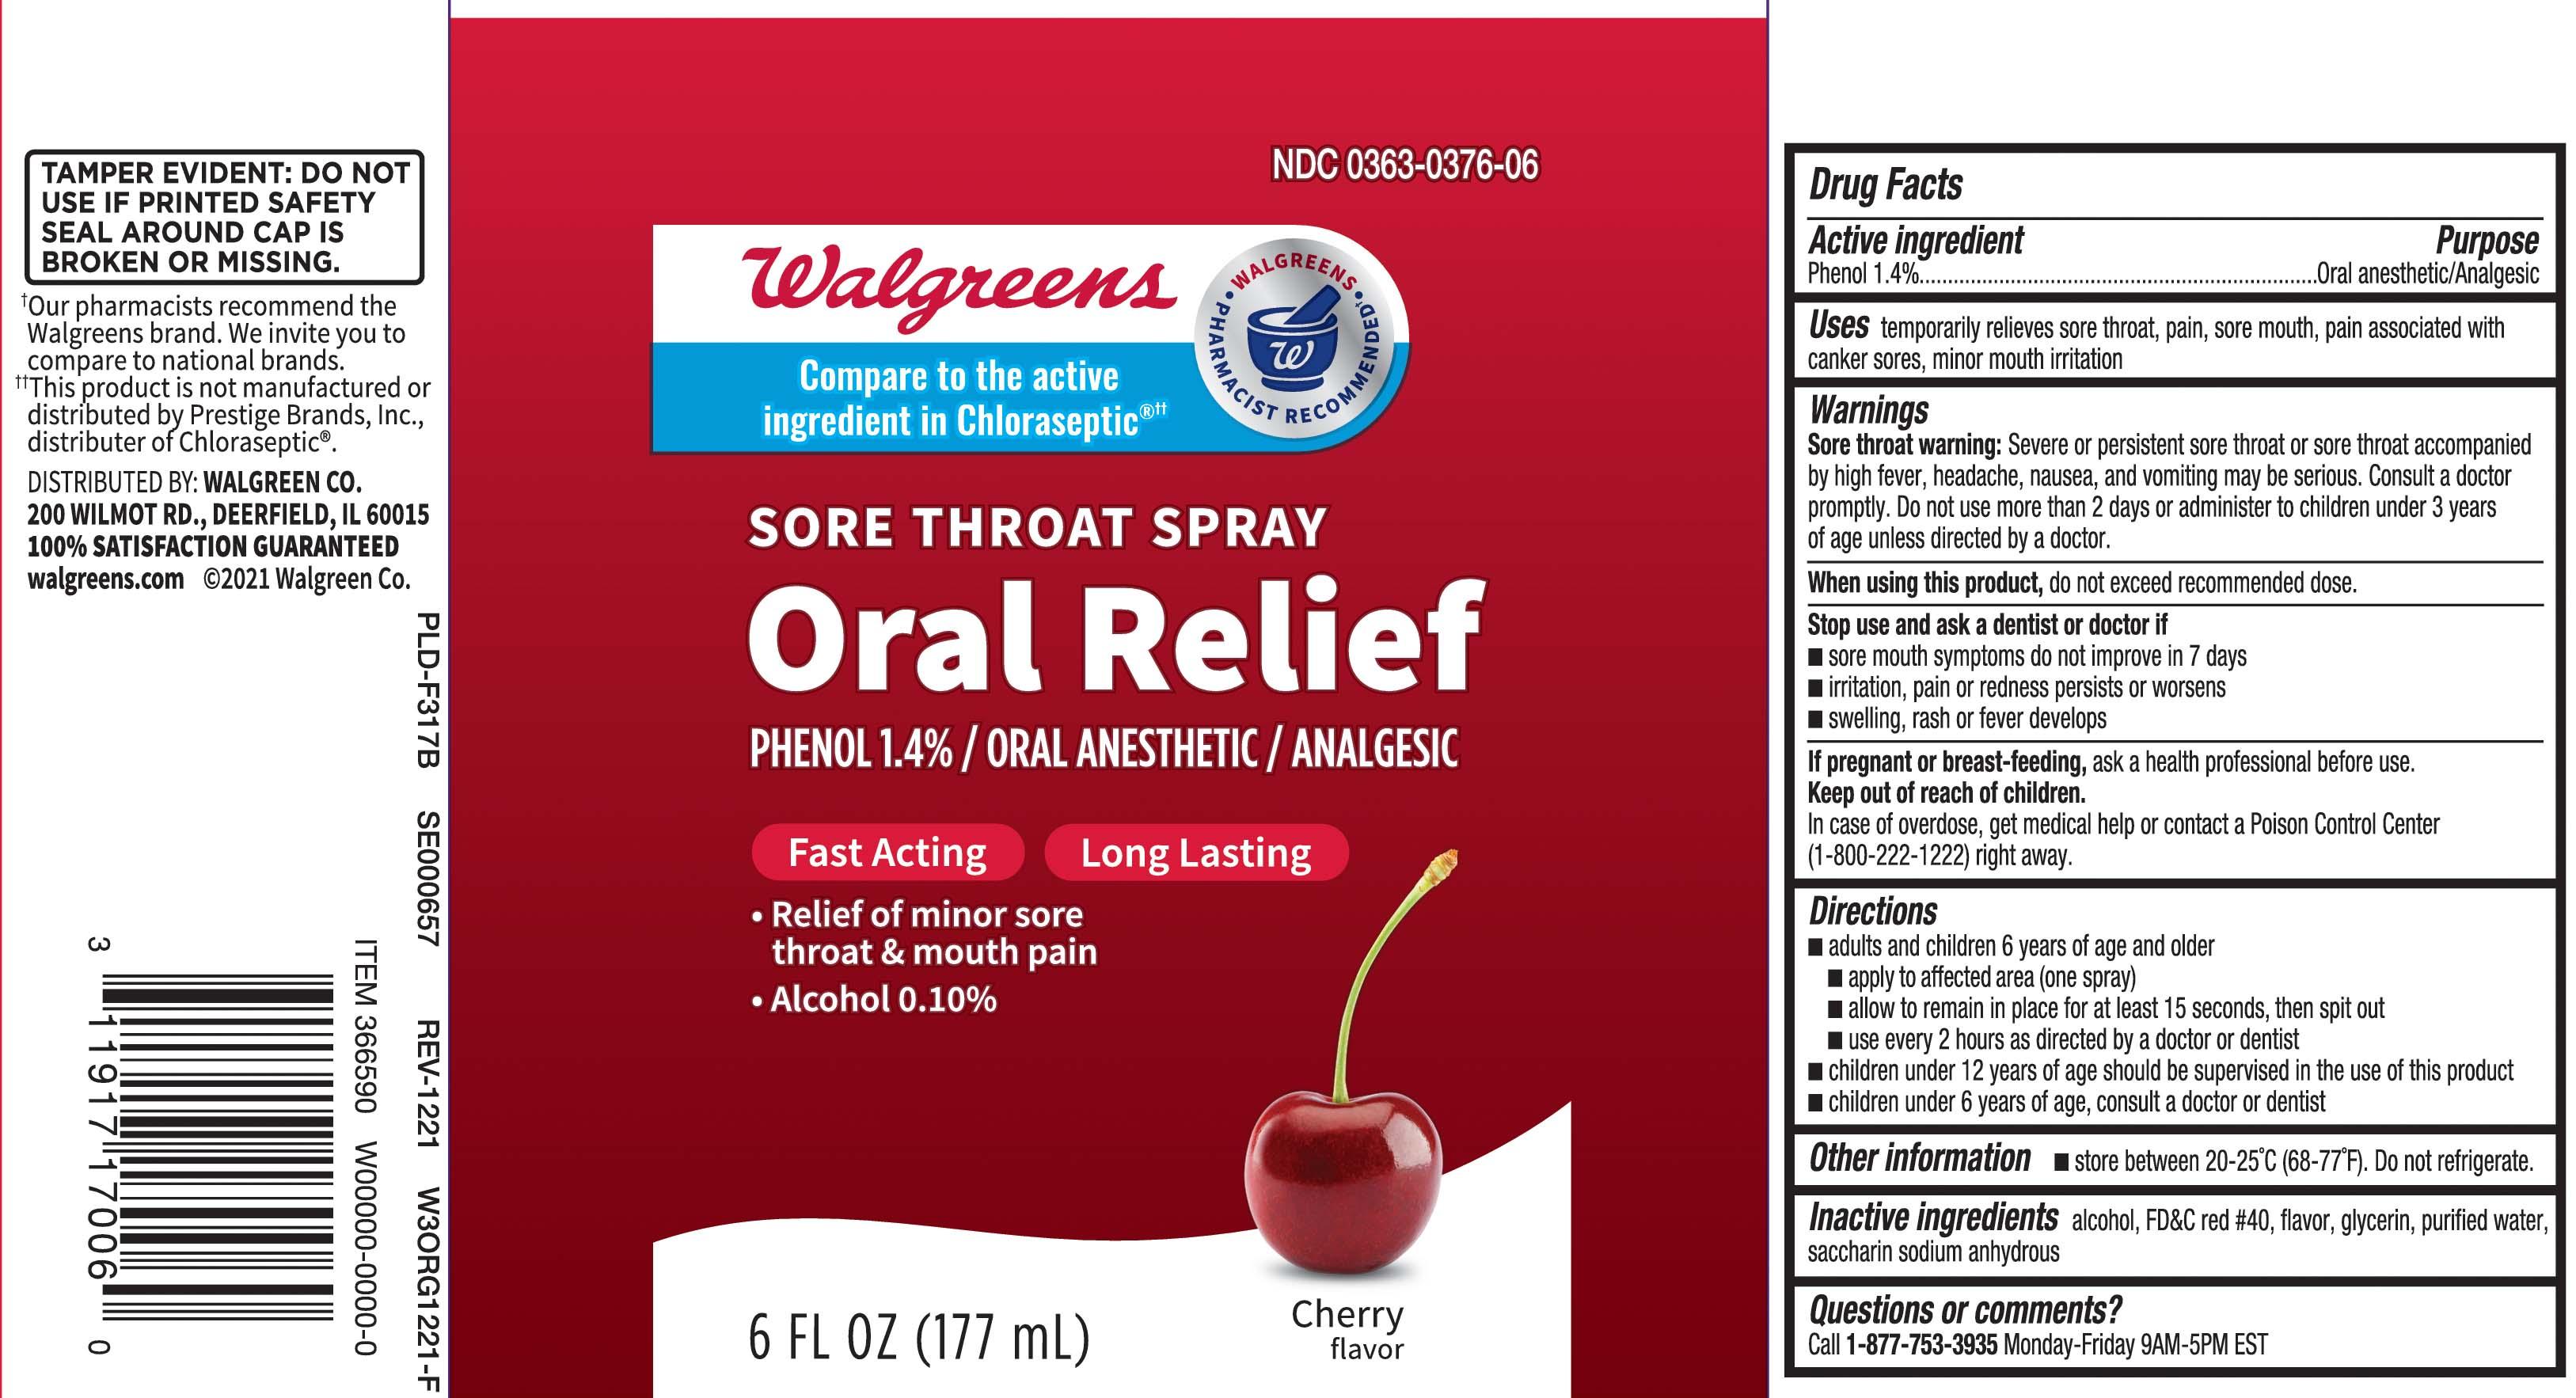 Sore Throat Cherry (Phenol) Spray [Walgreens]